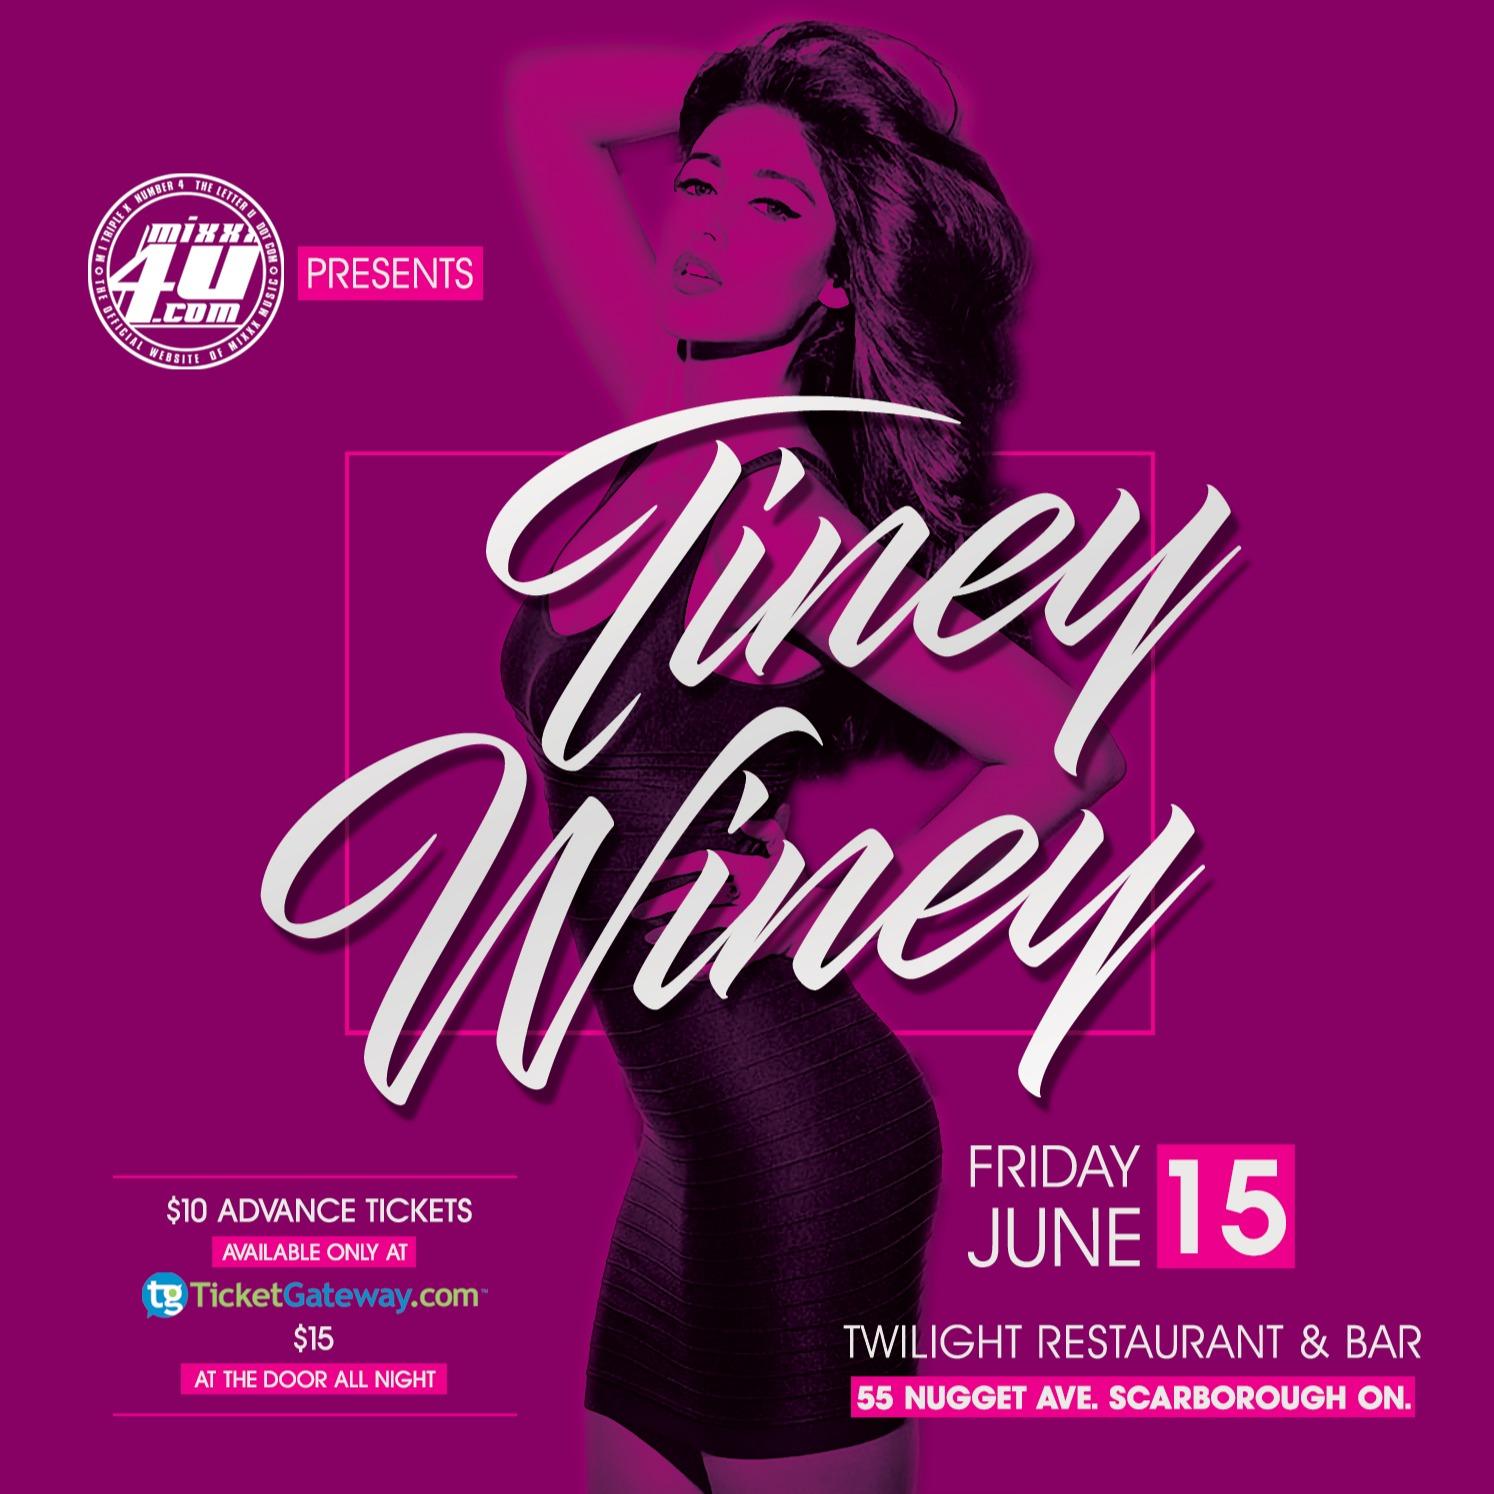 Tiney Winey